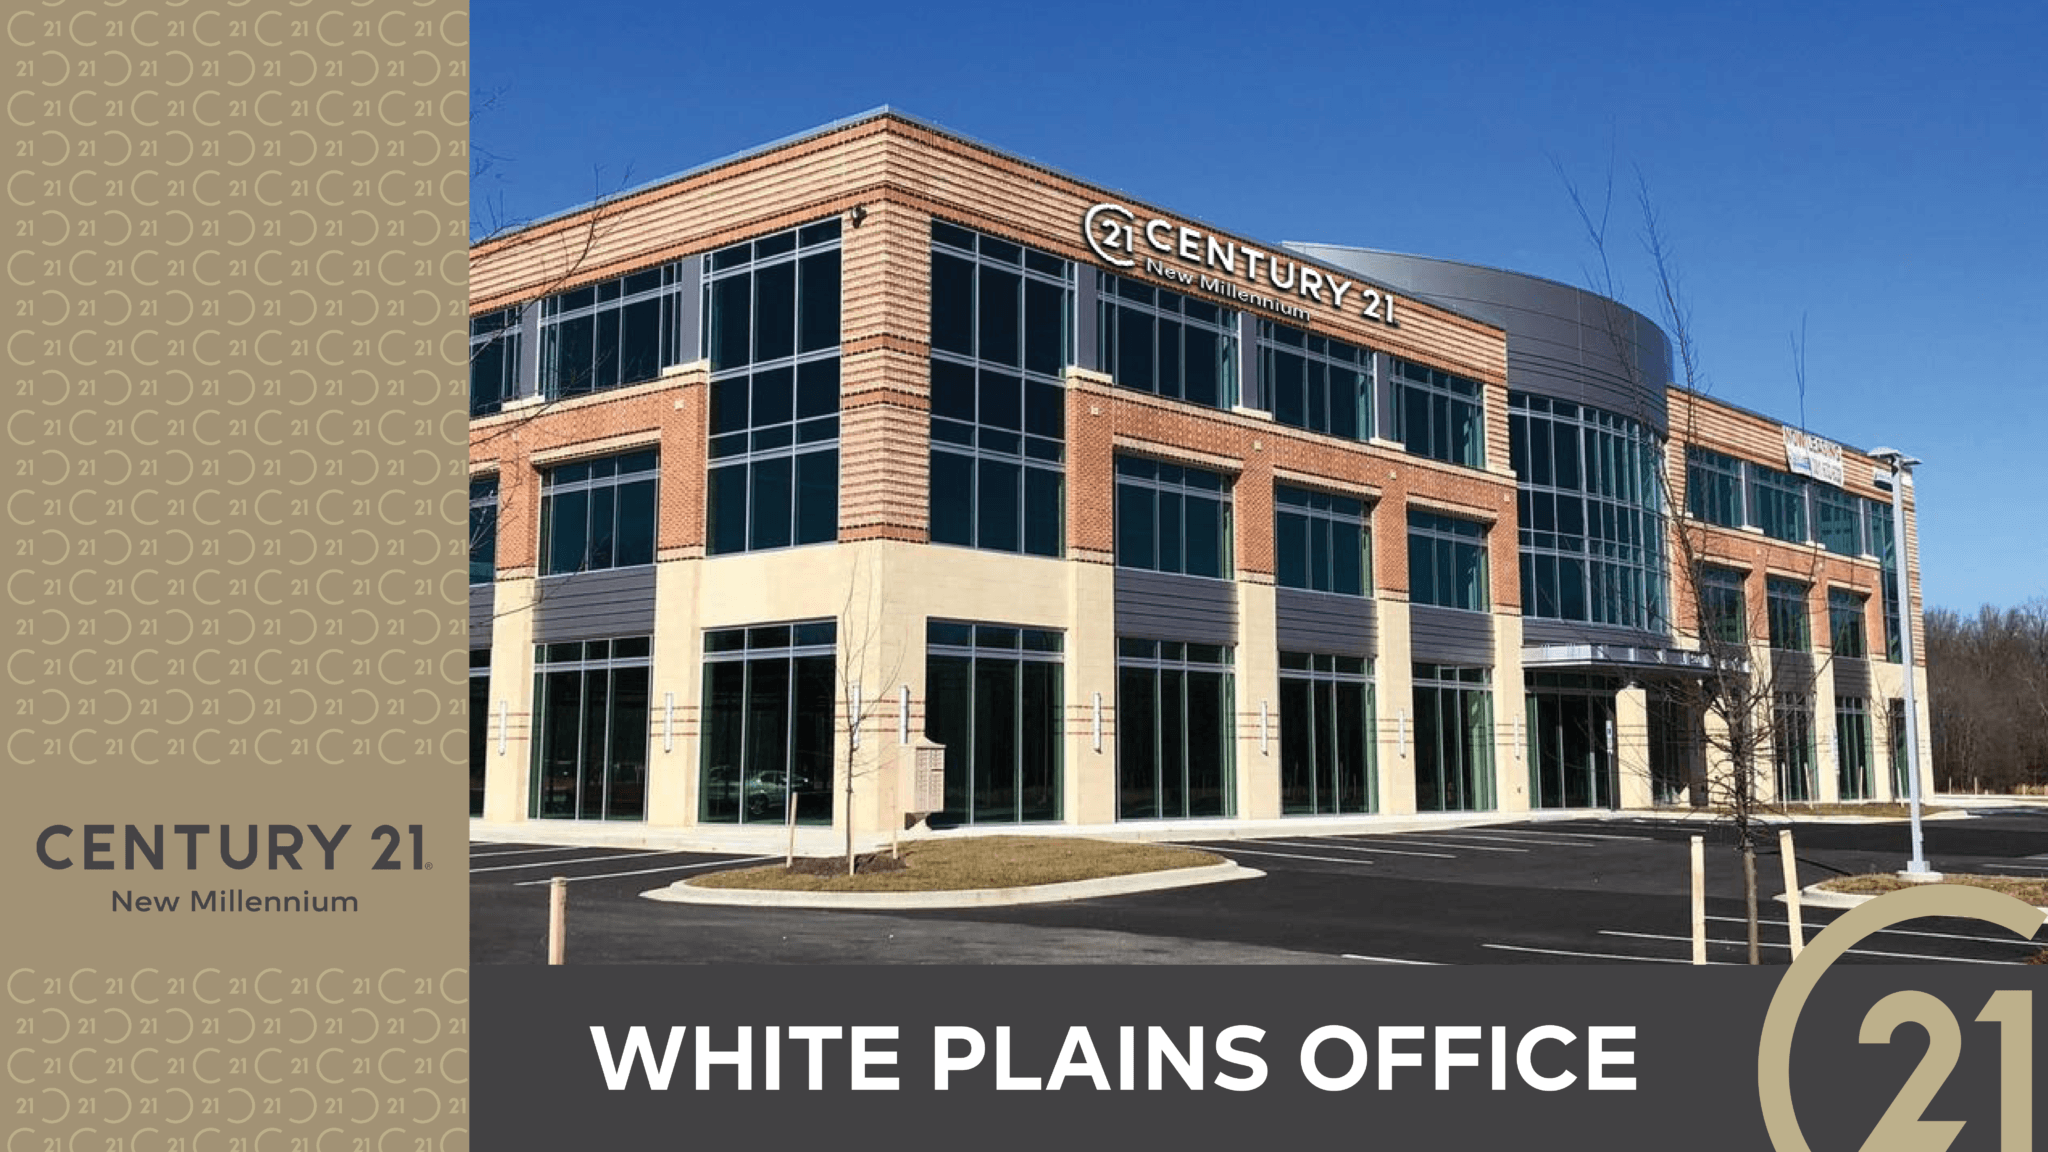 White Plains Office   CENTURY 21 New Millennium